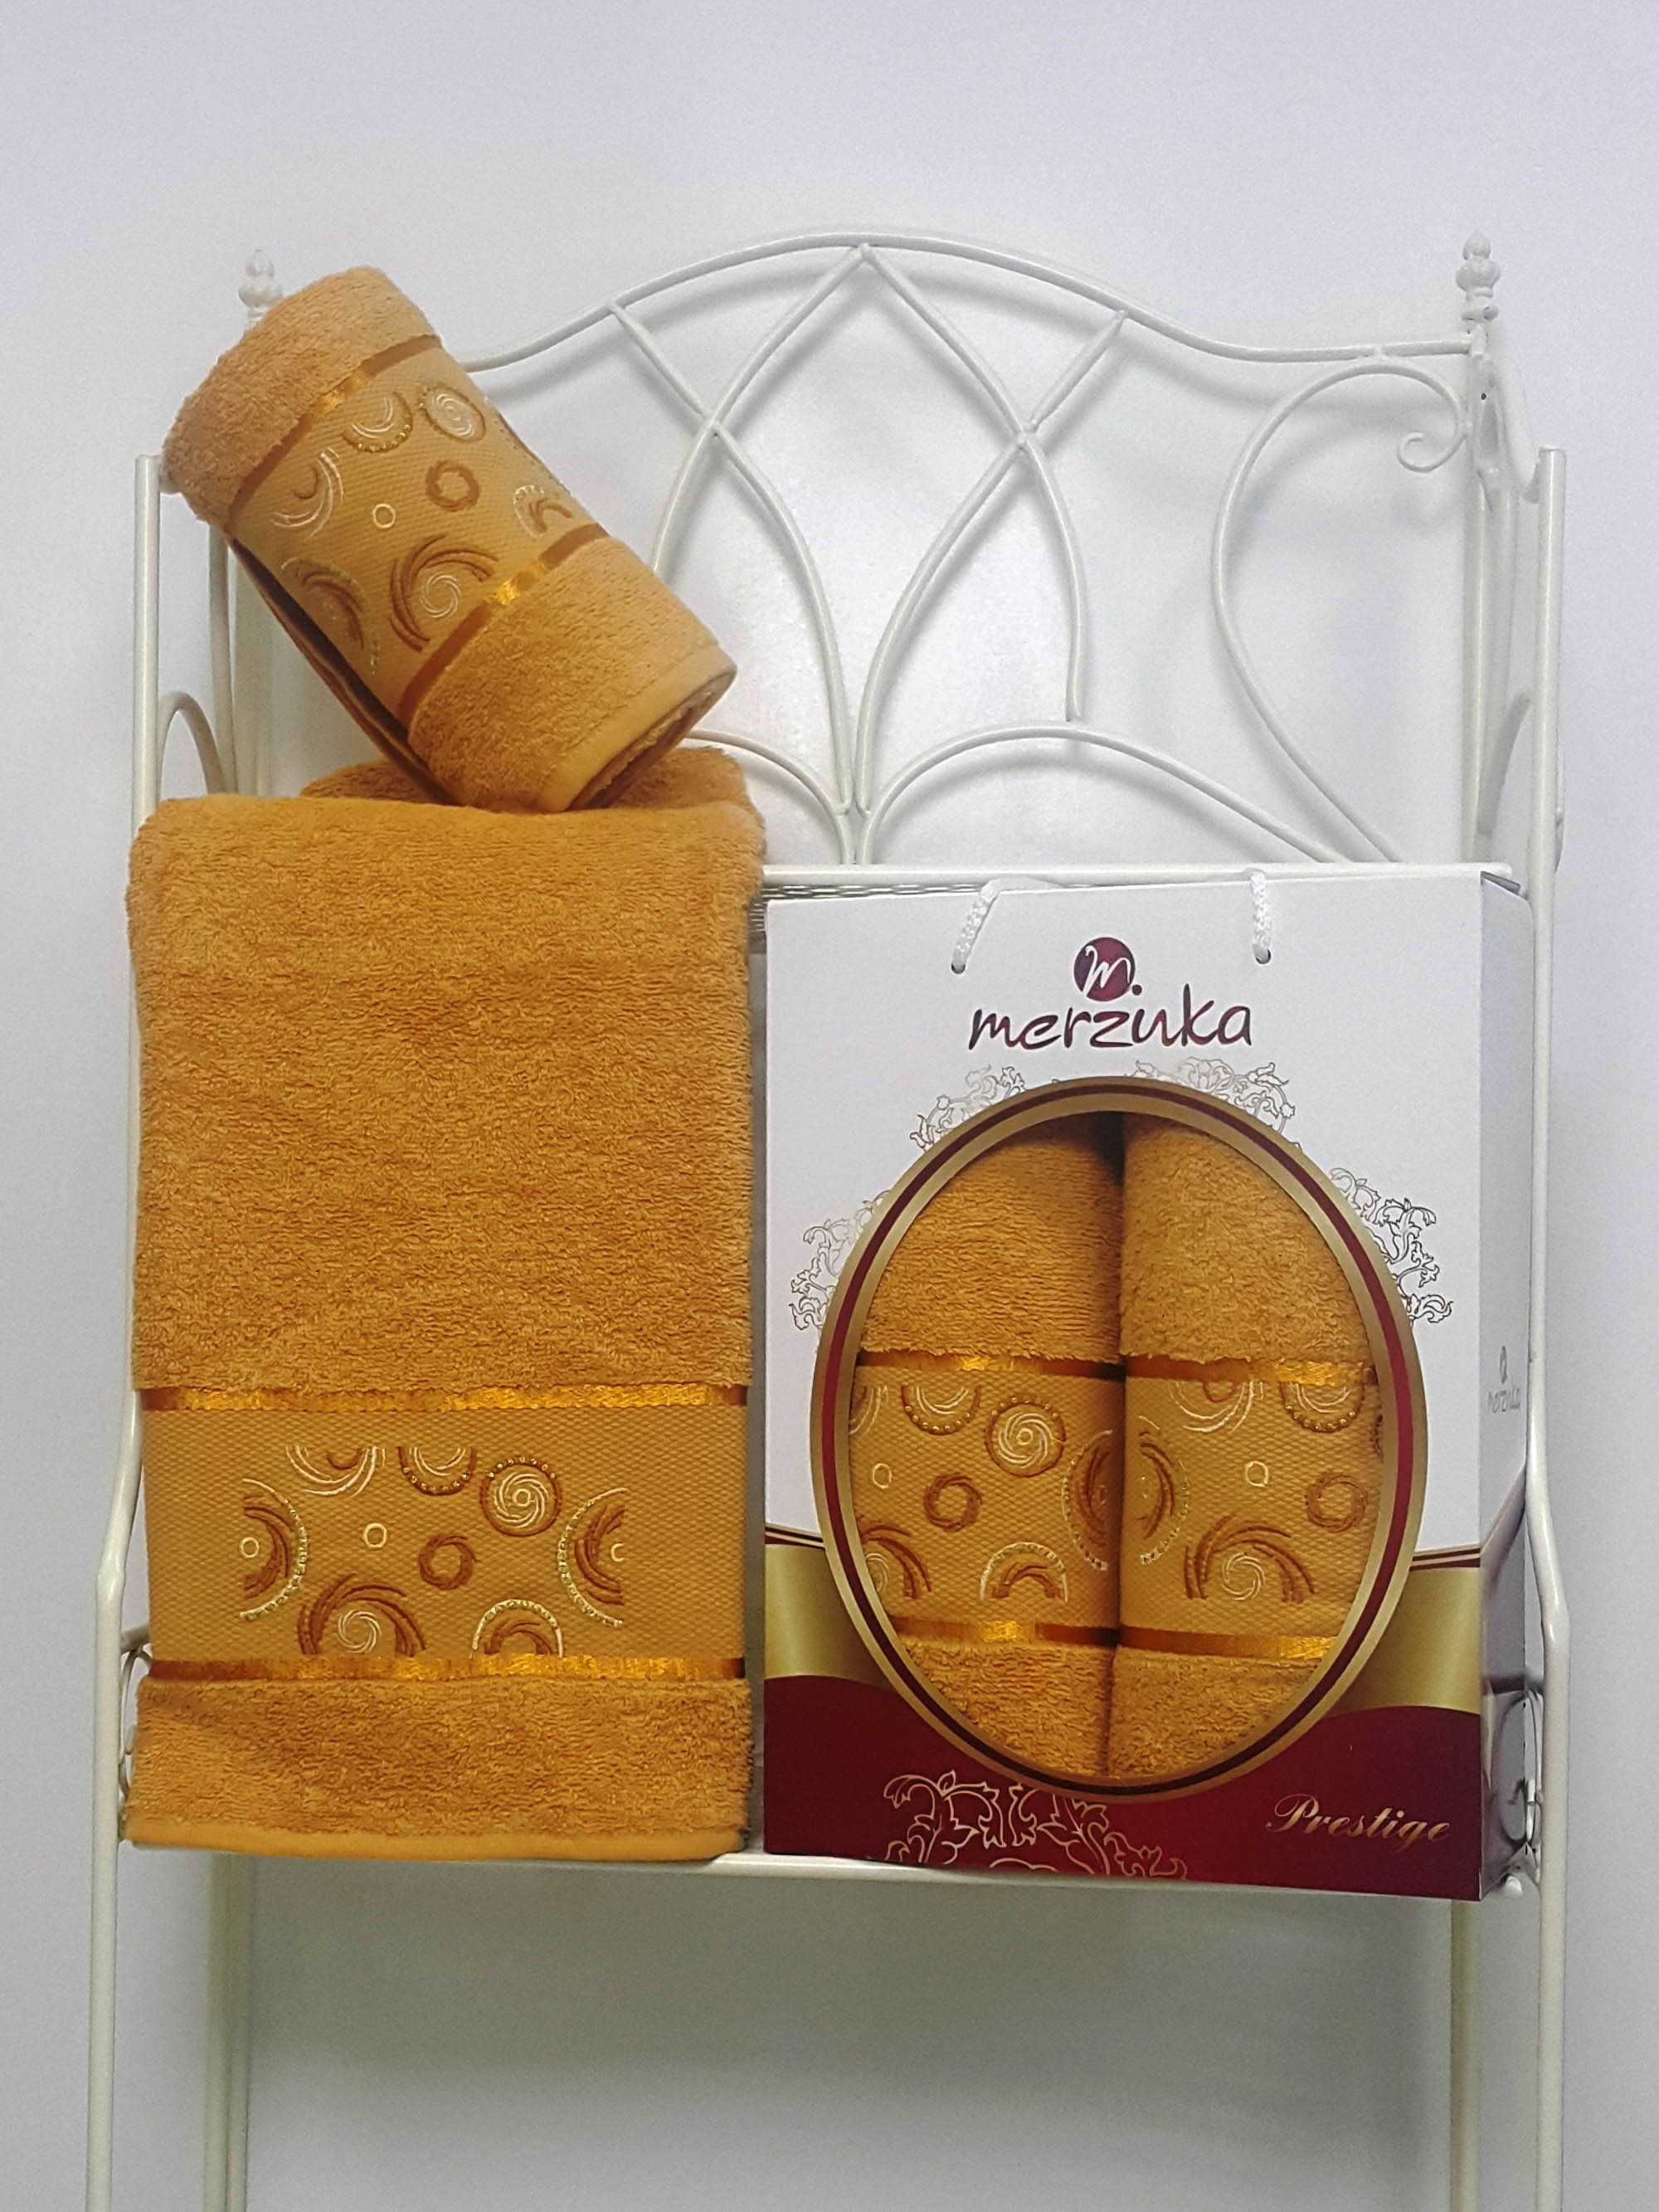 Полотенца Oran Merzuka Набор из 2 полотенец Prestij Цвет: Горчичный набор из 3 полотенец merzuka sakura 50х90 2 70х140 8432 оранжевый